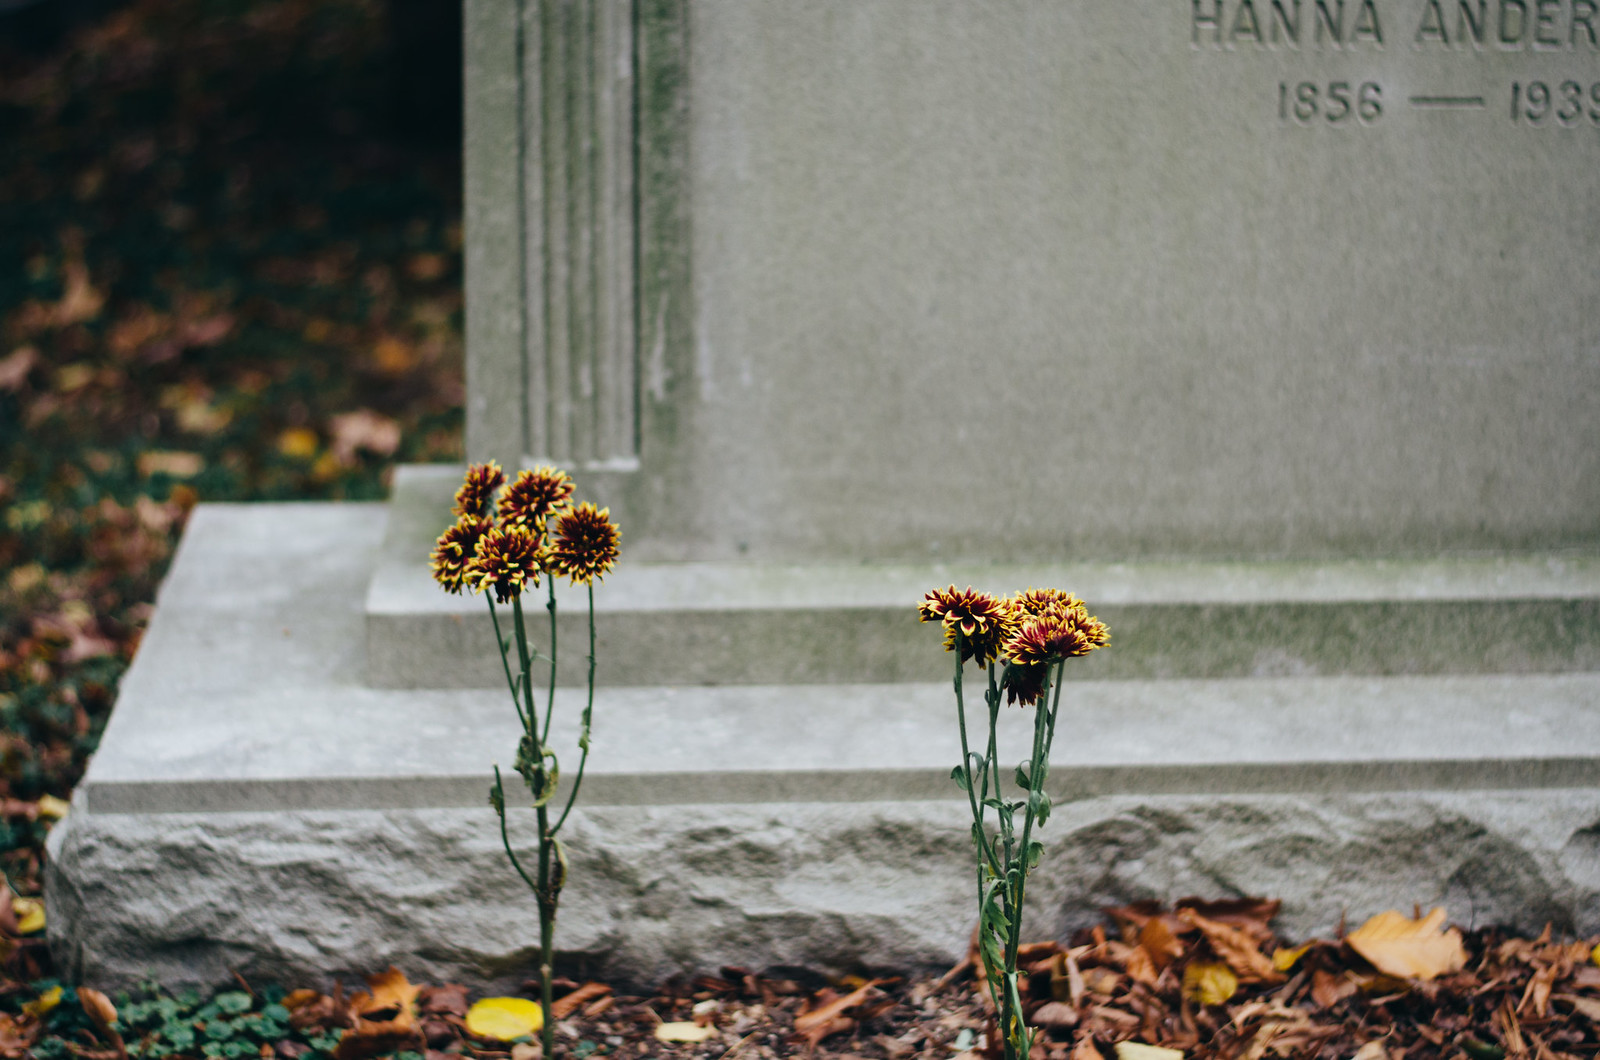 Flowers and Gravestones on juliettelaura.blogspot.com